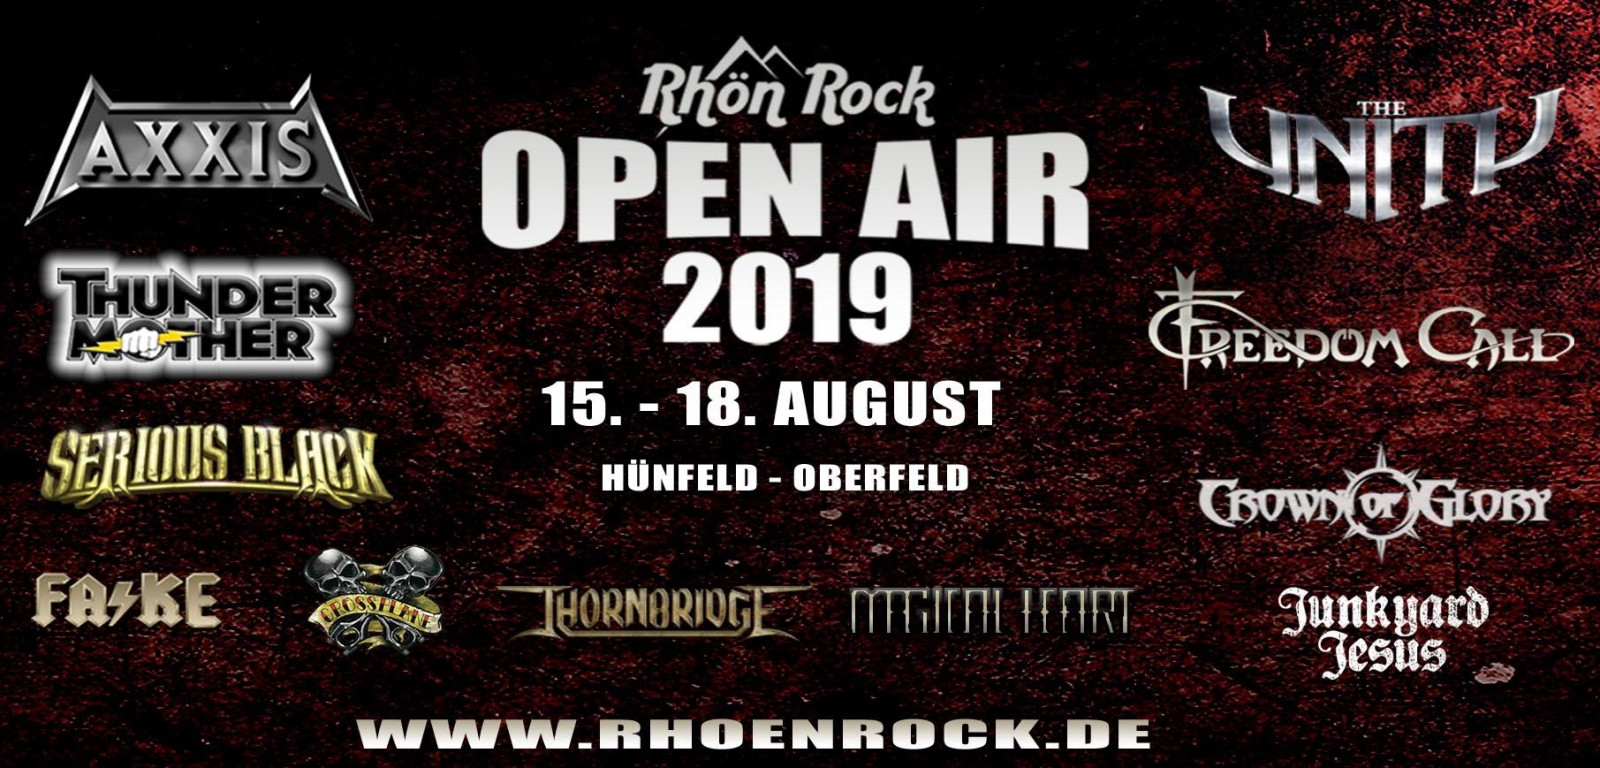 Rhön Rock Open Air - Festivalgelände  - Hünfeld